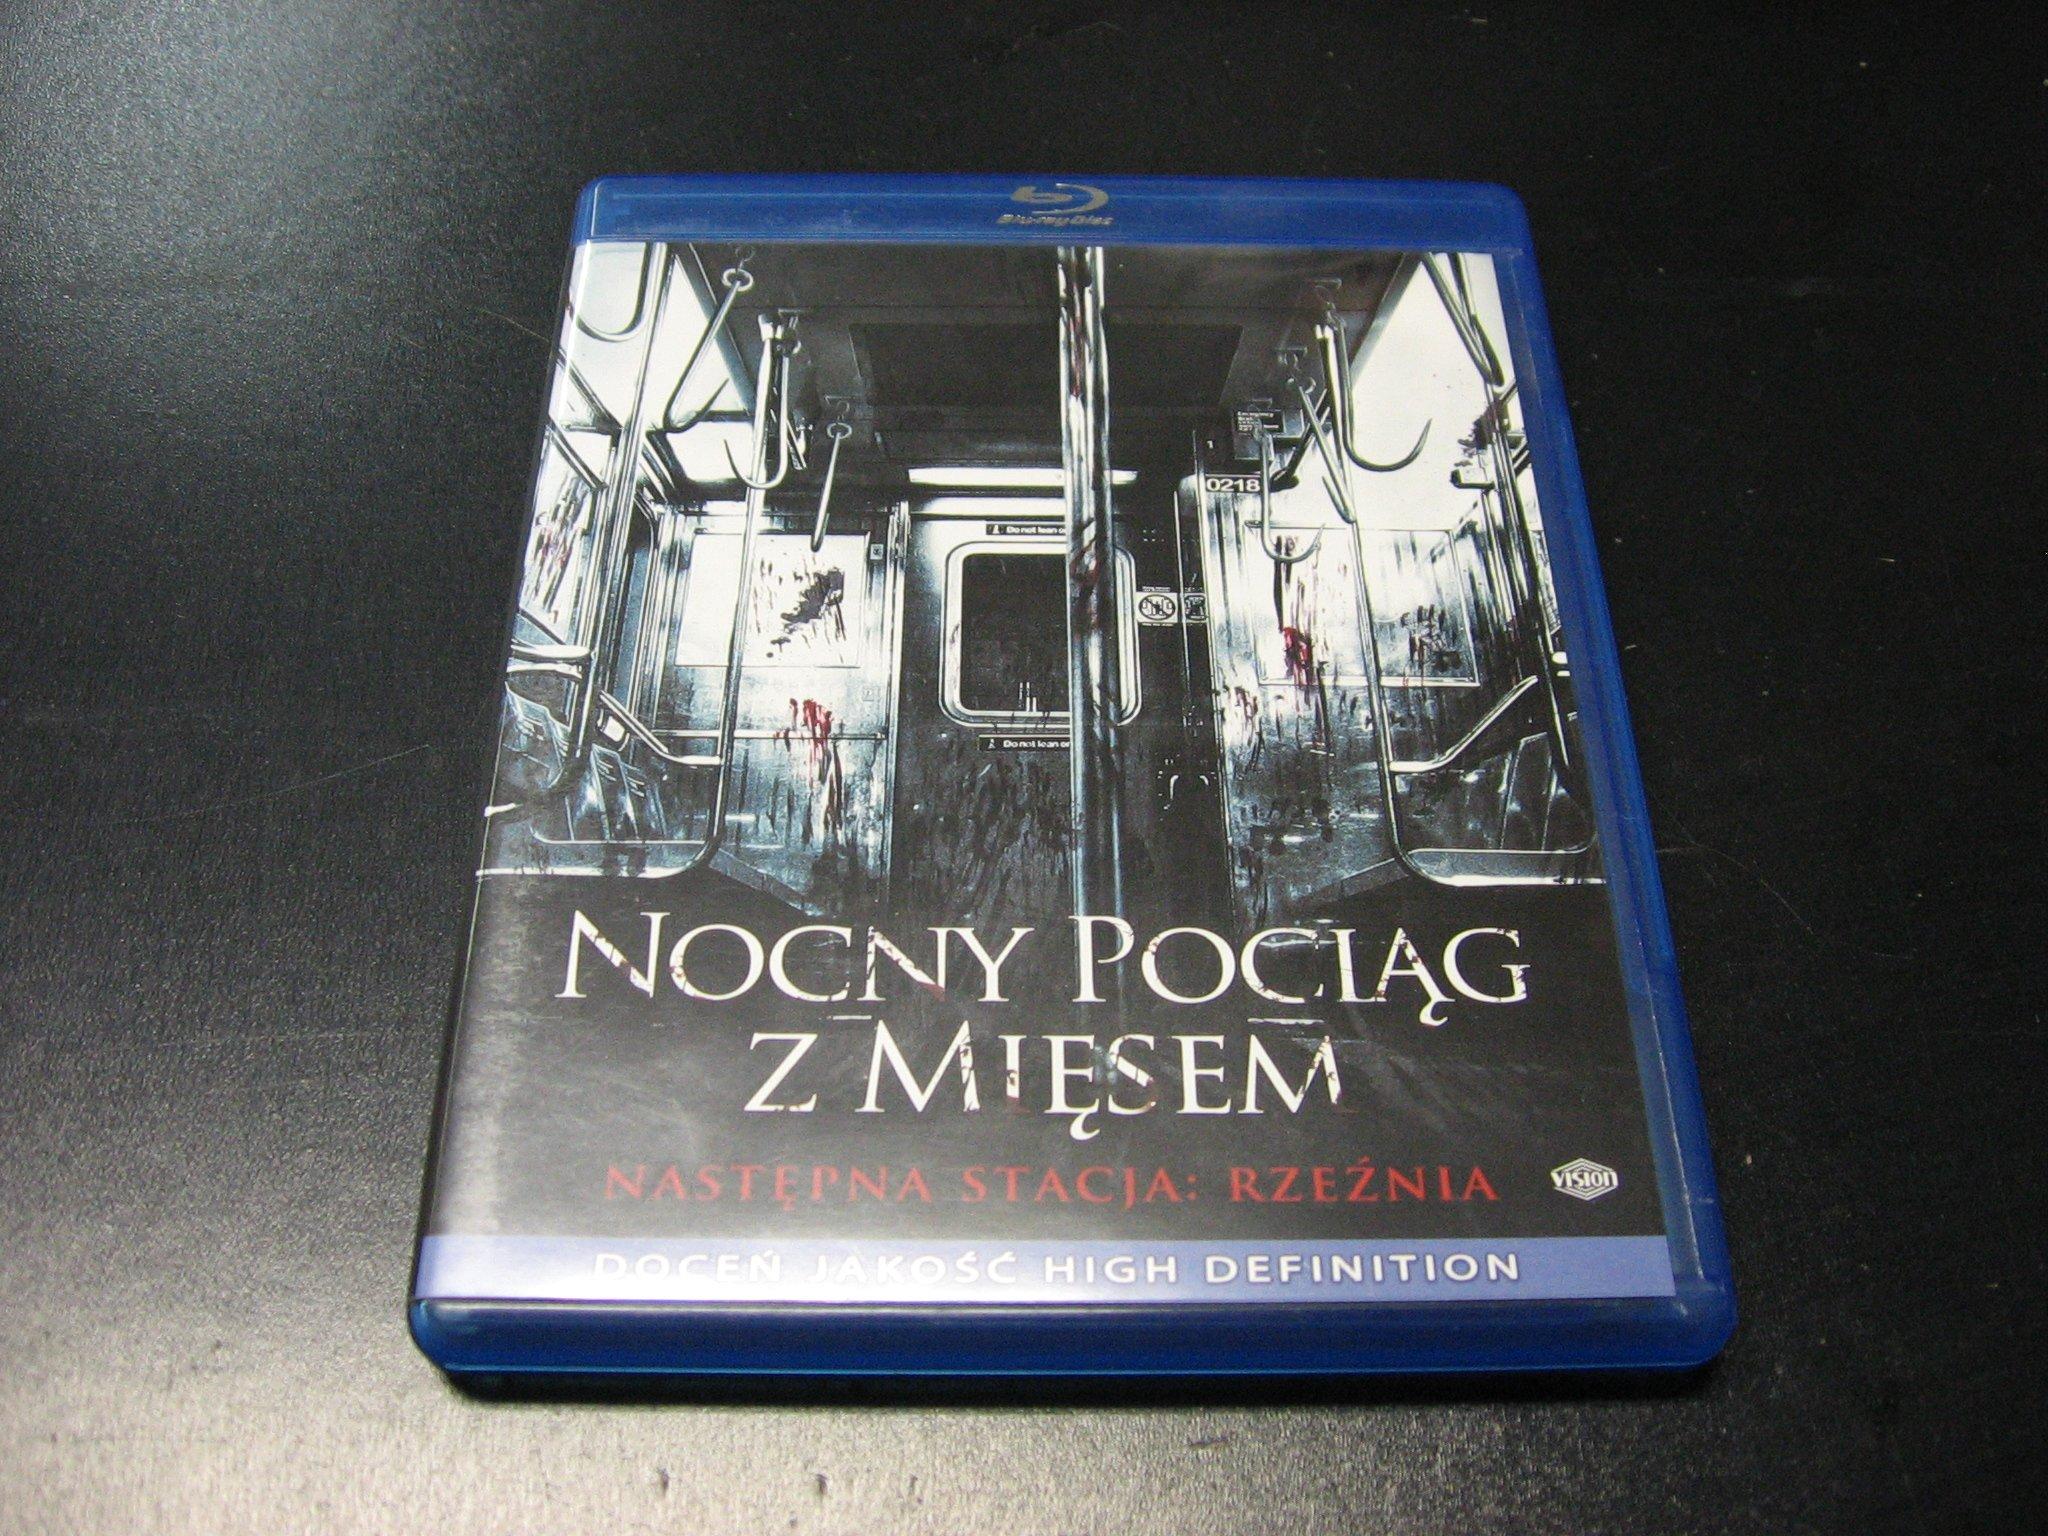 NOCNY POCIĄG Z MIĘSEM 066 `````````` Blu-rey ```````````` Opole